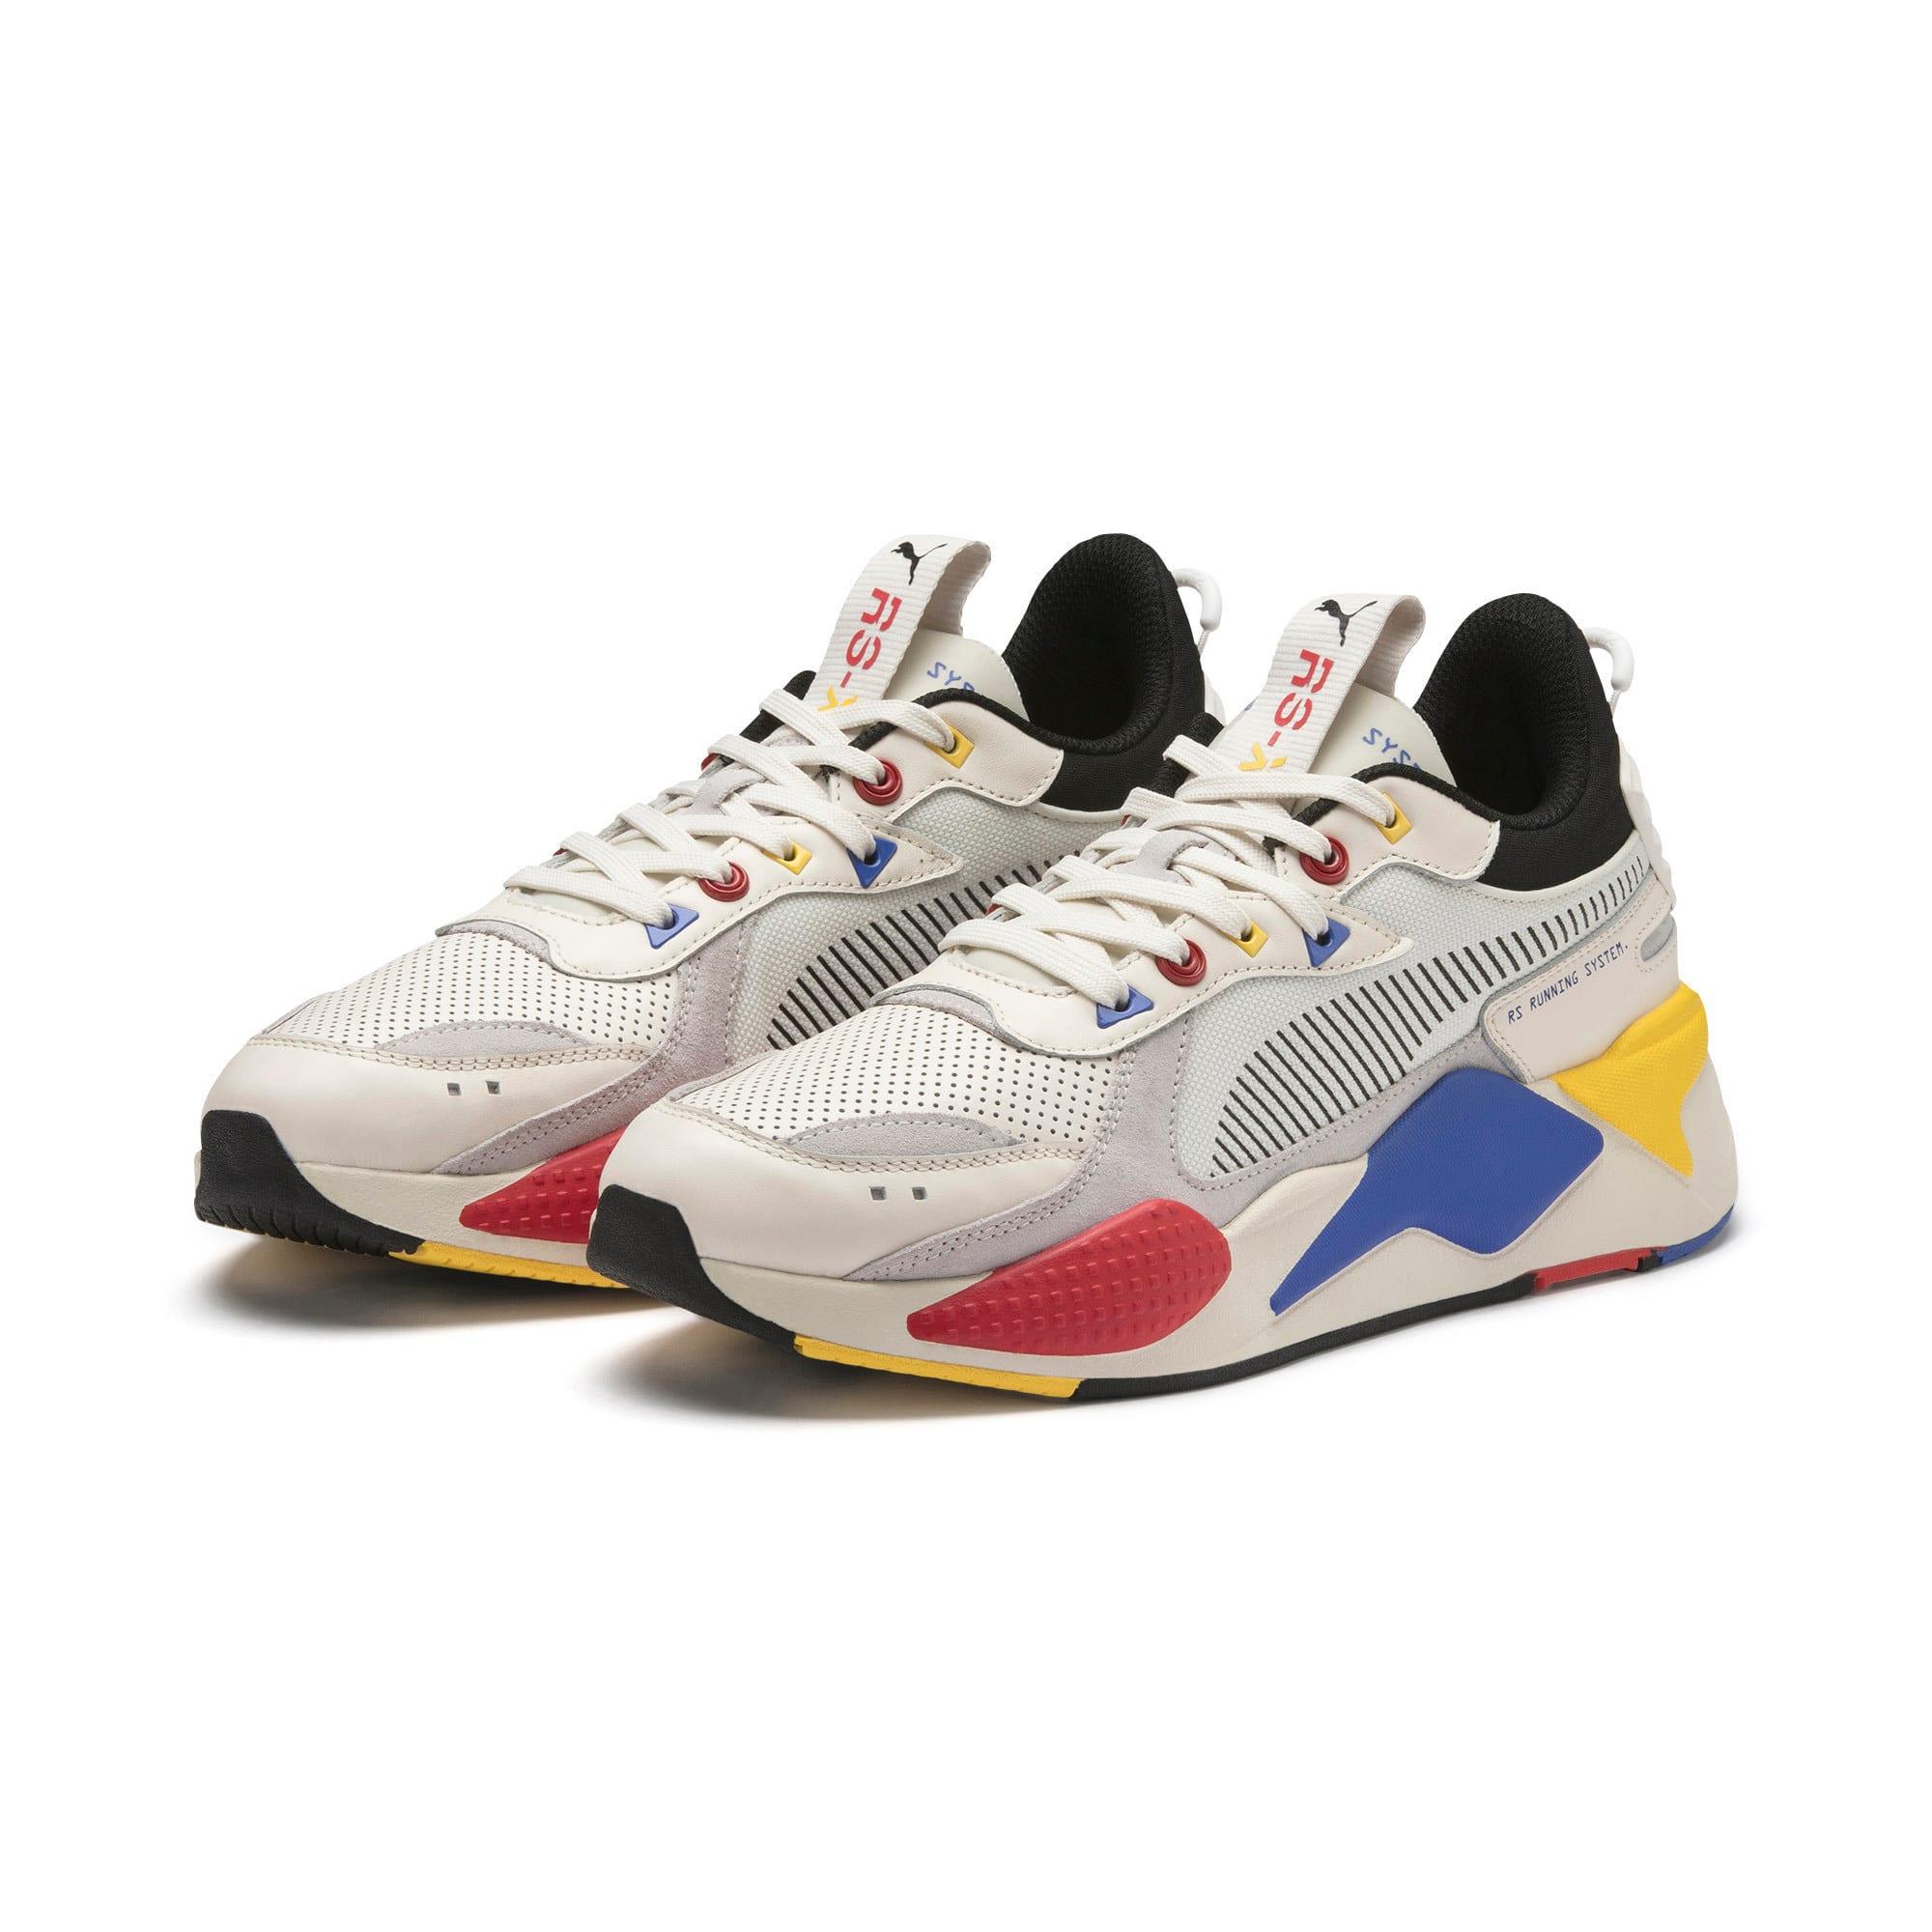 Thumbnail 3 of RS-X Colour Theory Sneaker, Whisper White-Puma Black, medium